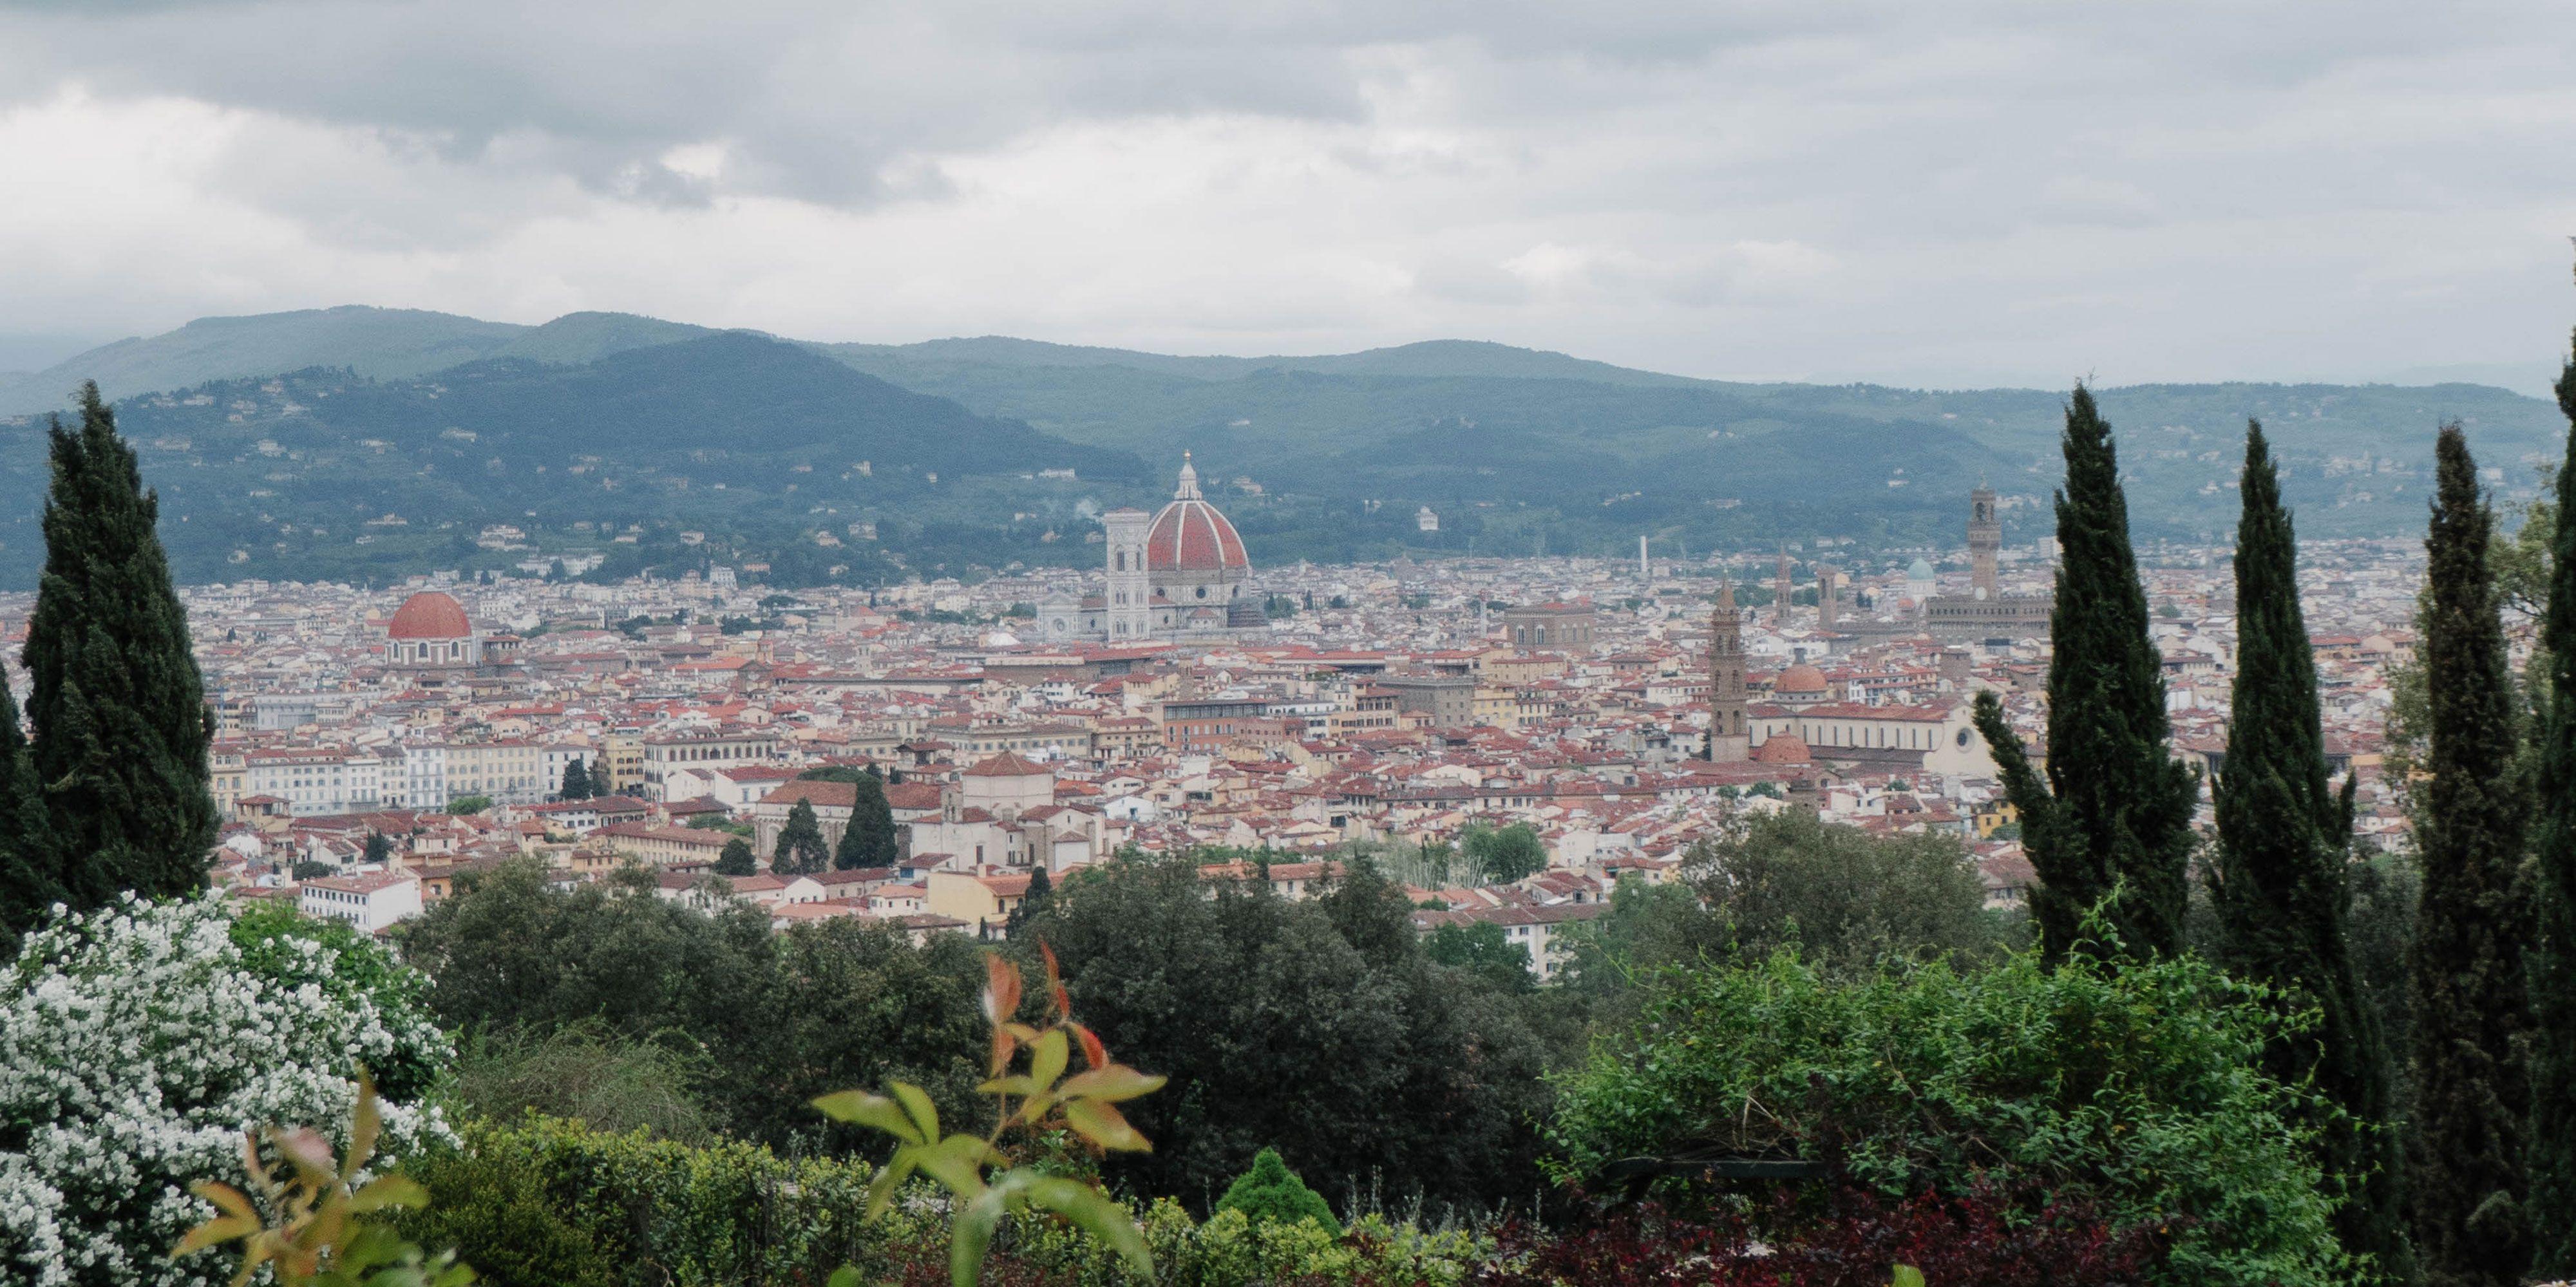 Indulge in a quintessentially Italian getaway at Torre di Bellosguardo